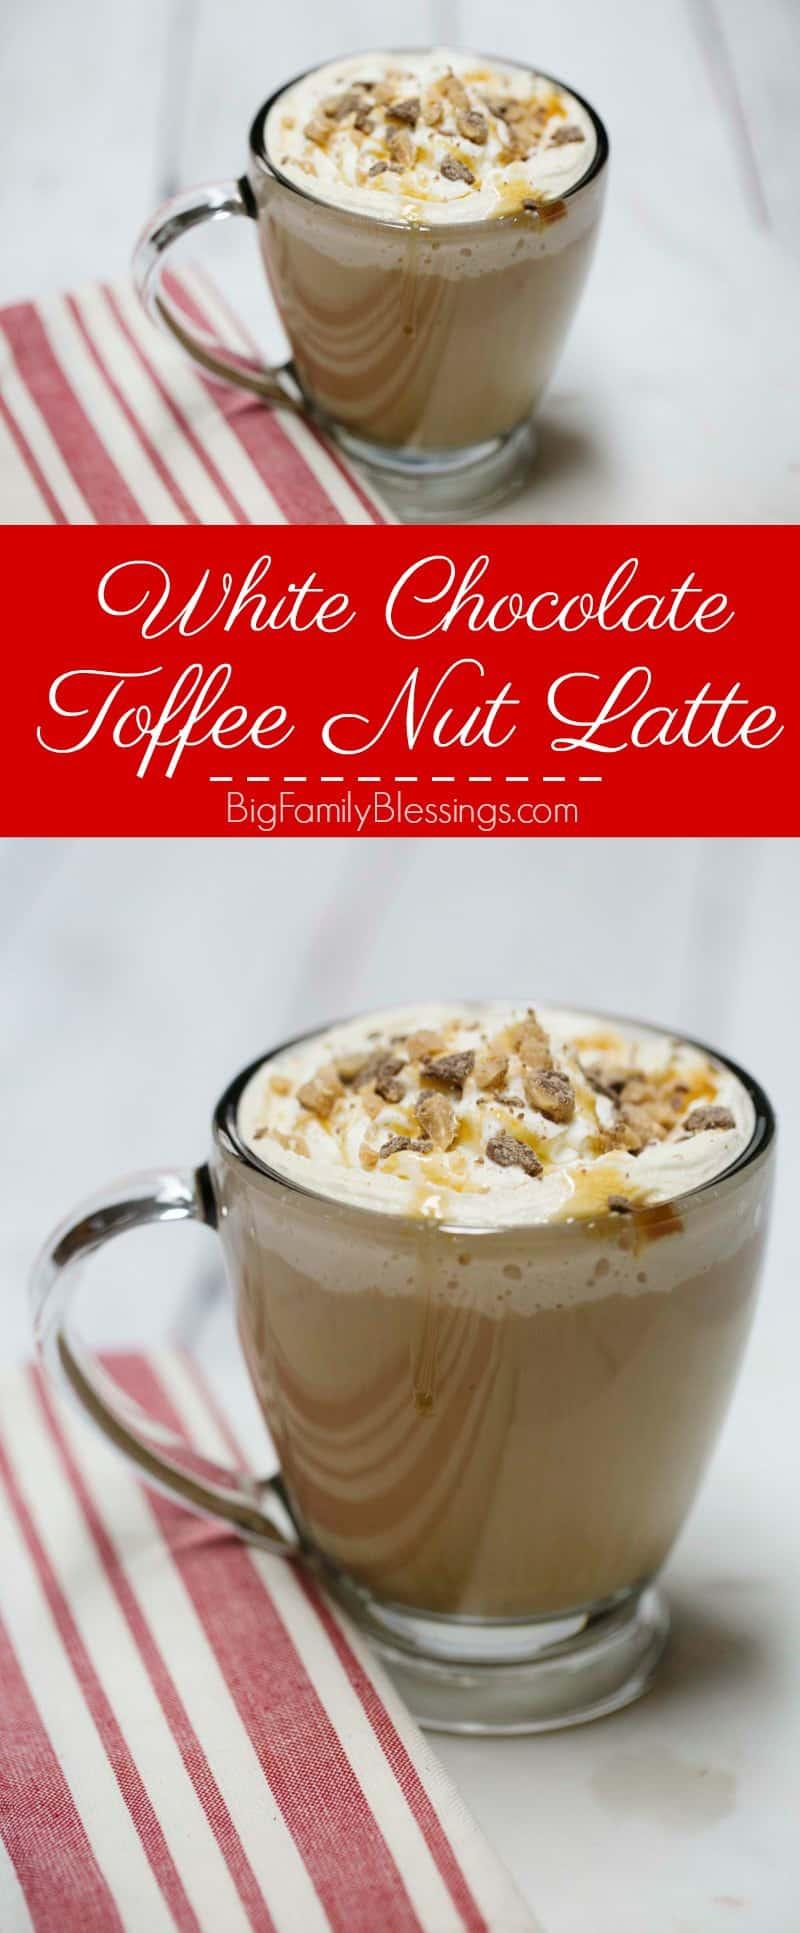 White Chocolate Toffee Nut Latte